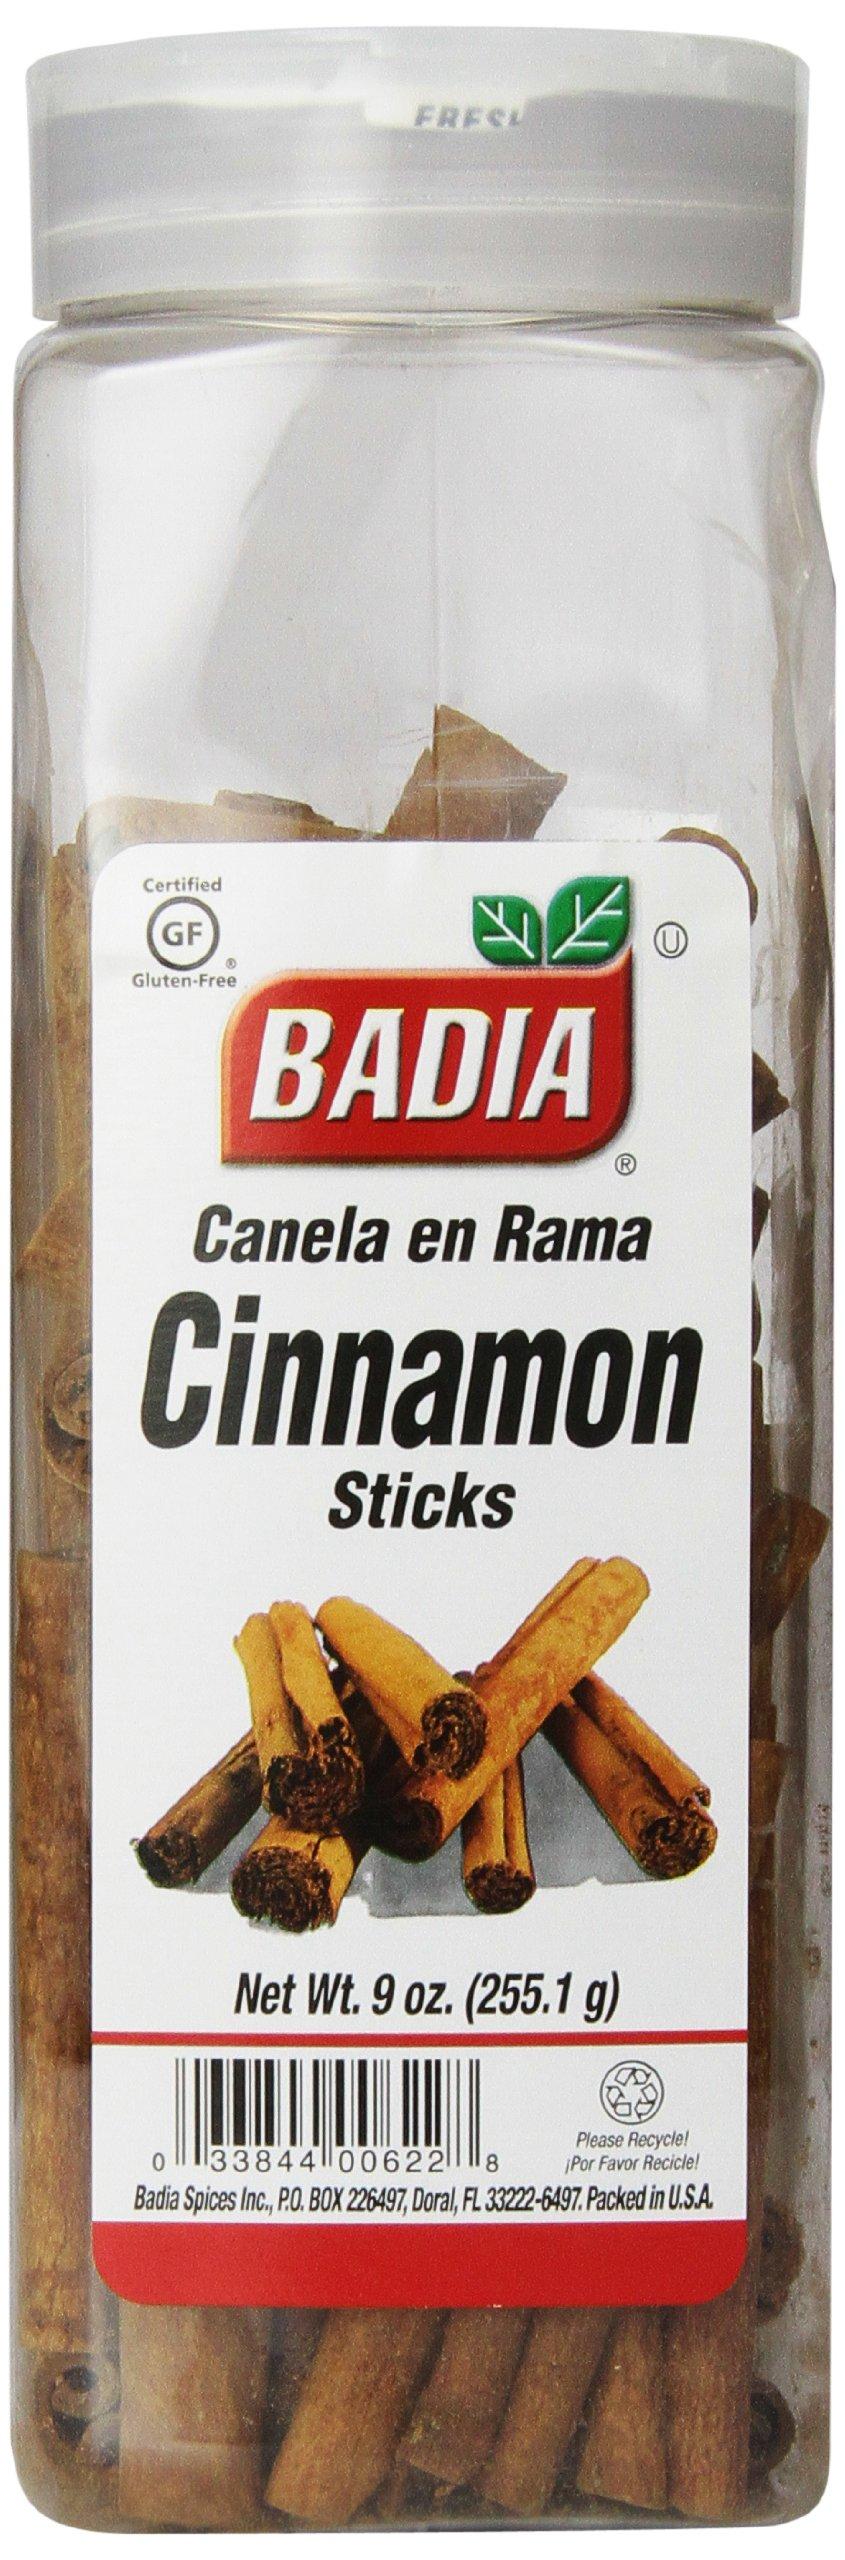 Badia Cinnamon Sticks, 9-Ounce  (Pack of 6)